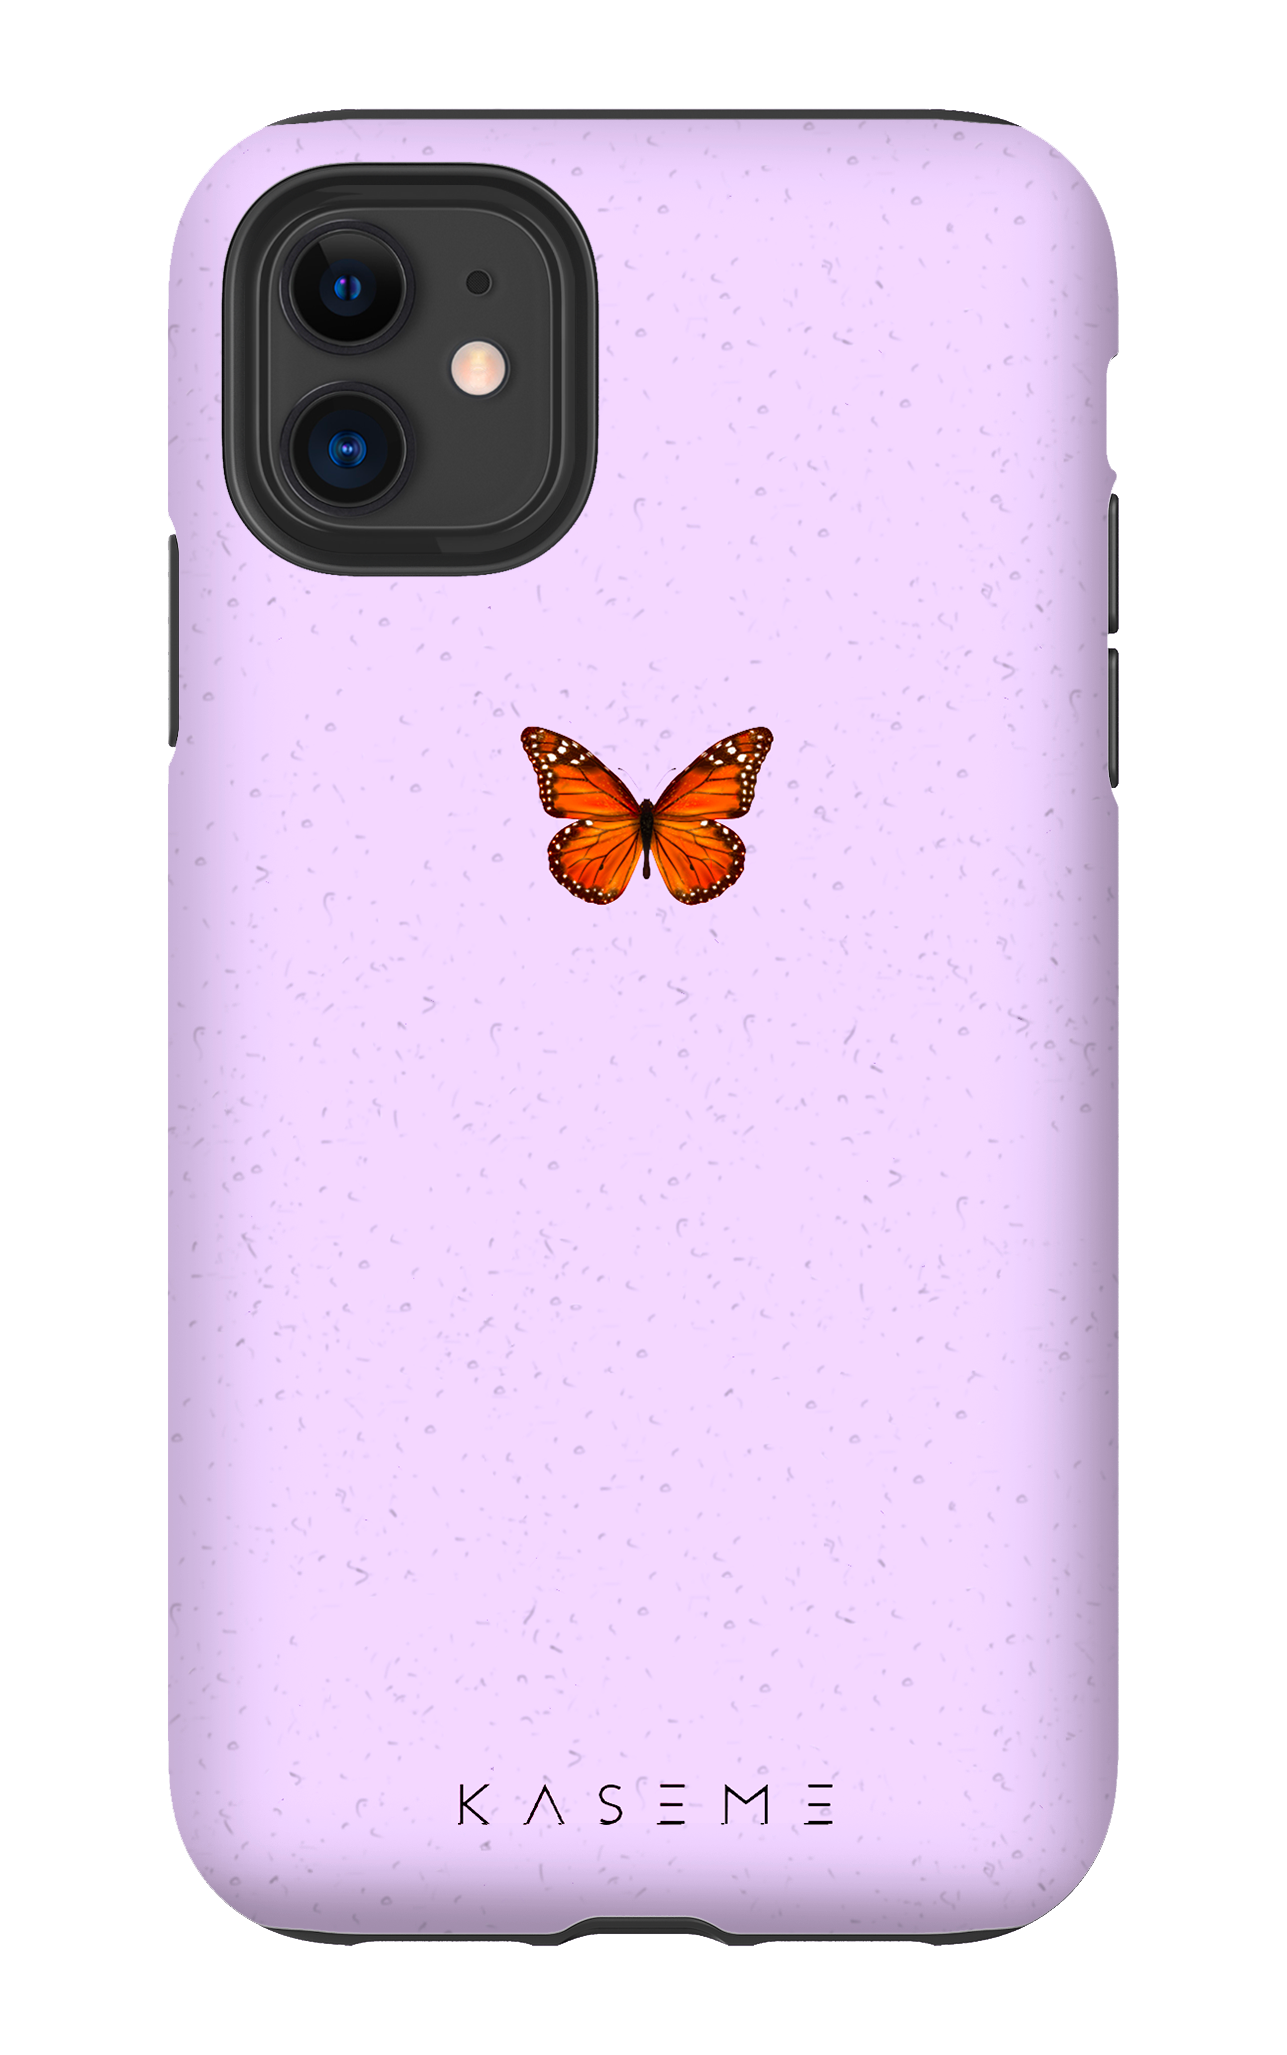 Heaven phone case